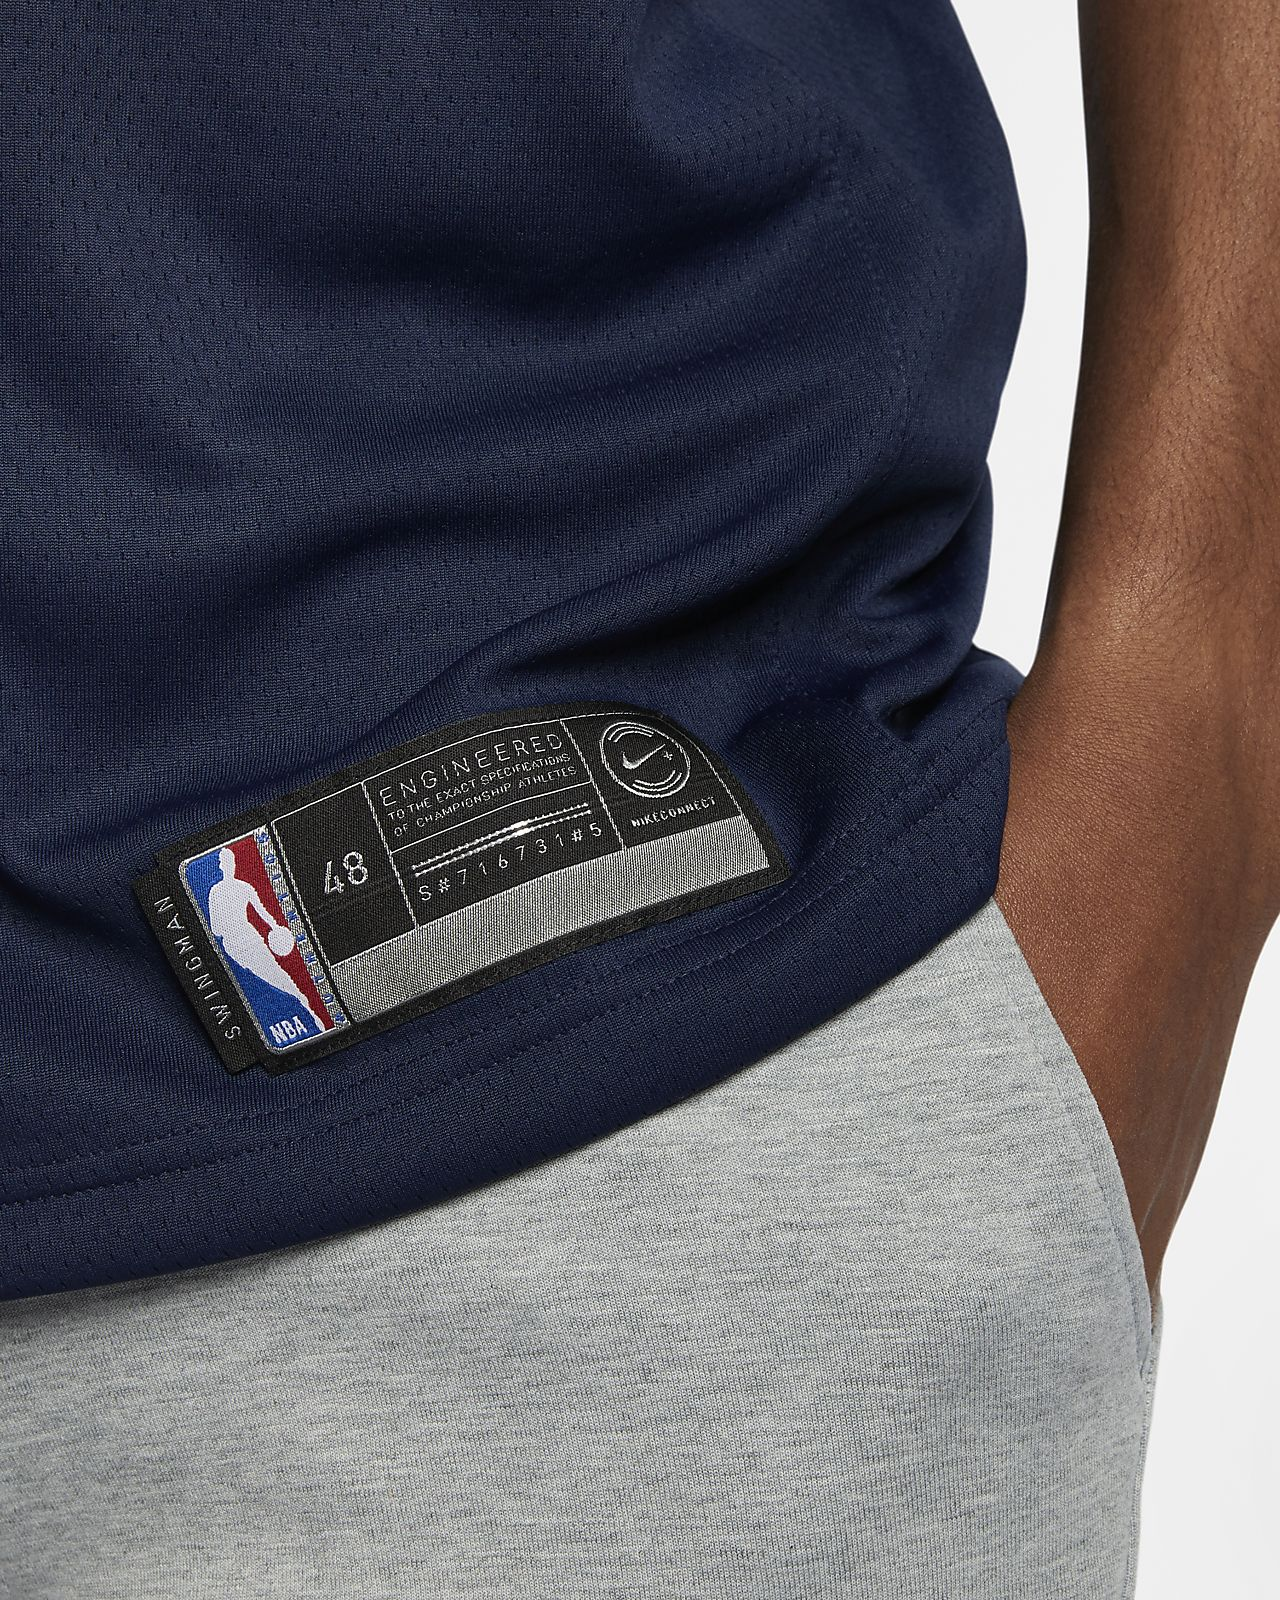 5f754c8bbb41 ... Rudy Gobert Icon Edition Swingman (Utah Jazz) Men s Nike NBA Connected  Jersey